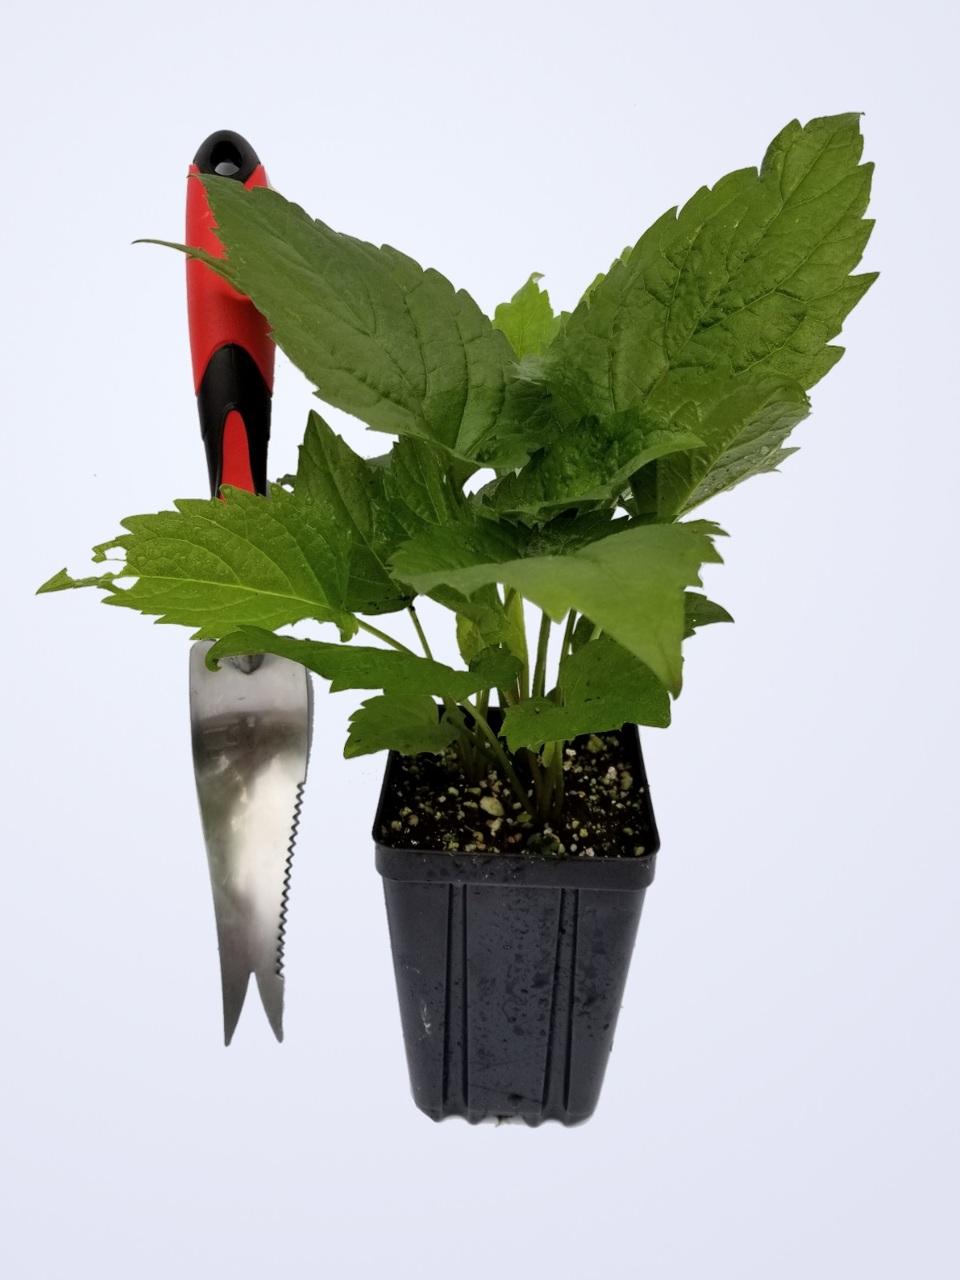 Aster divaricatus - White Wood Aster - Shovel shown for size comparison Quart Pot by GreenTec Nursery